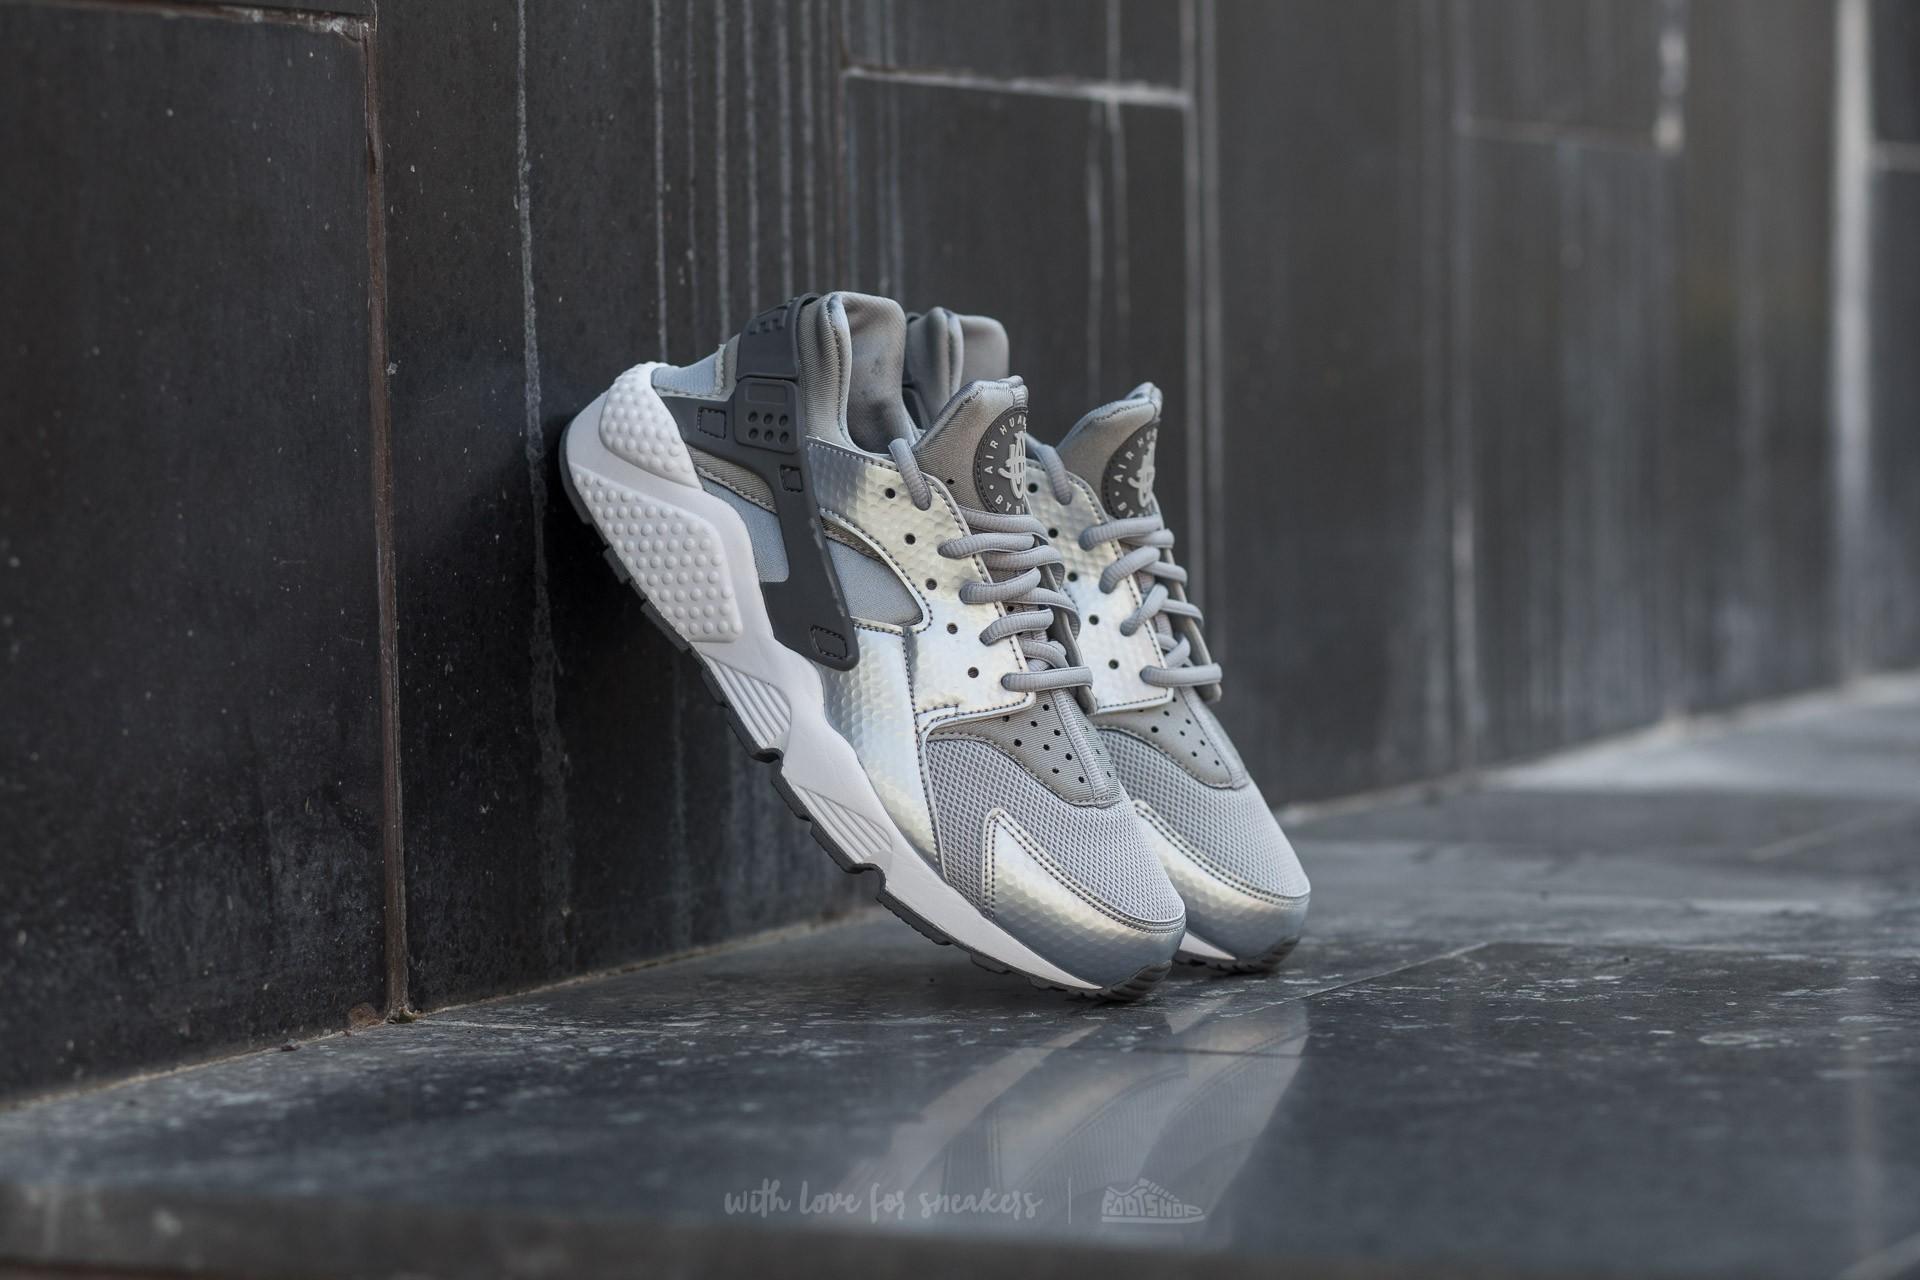 Nike Wmns Air Huarache Run Wolf Grey  Dark Grey-White  80f88ccbee04